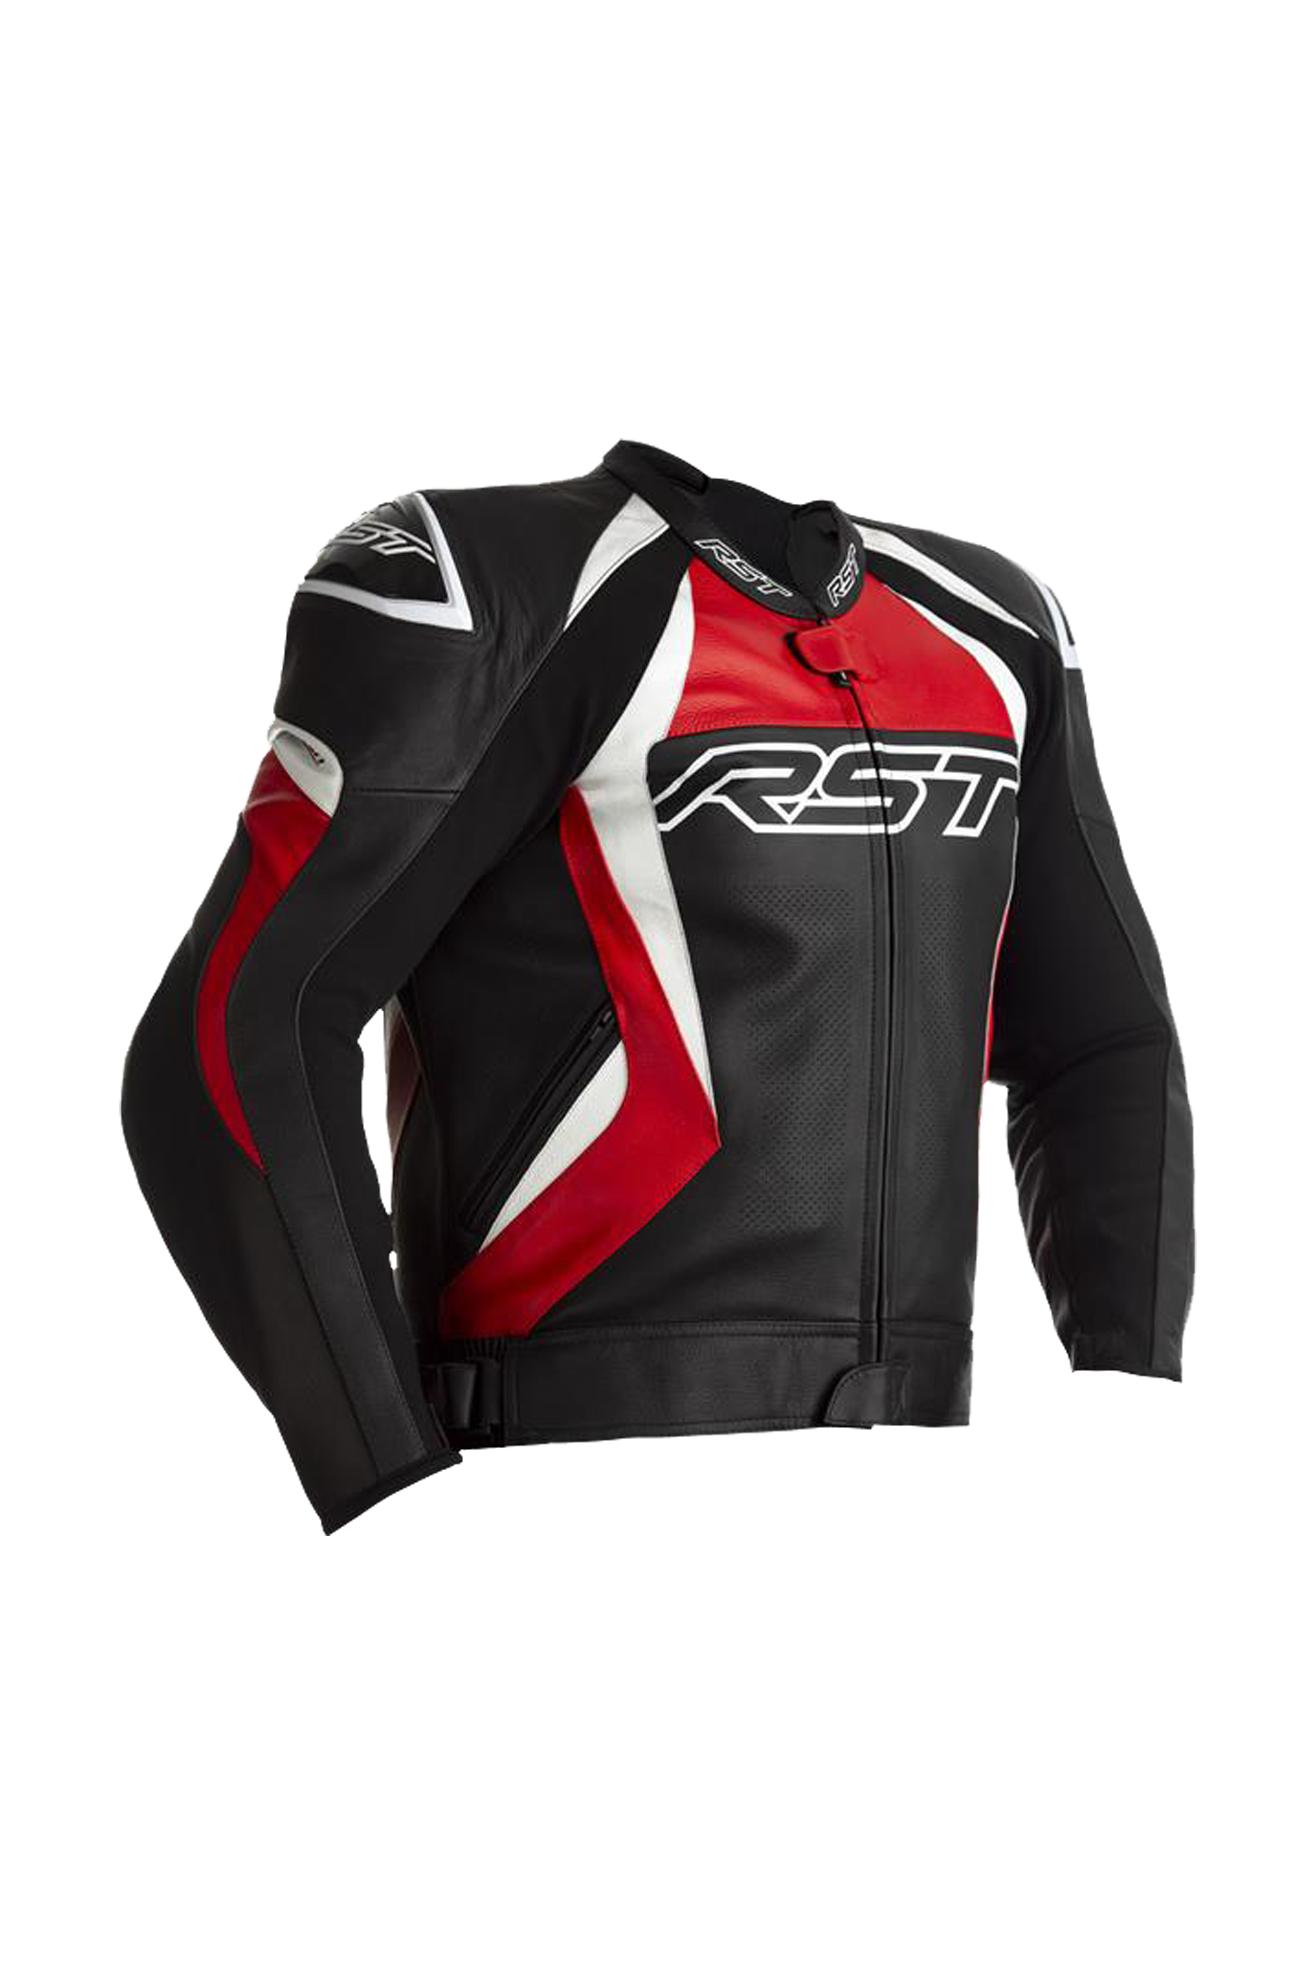 rst giacca moto  tractech evo 4 rossa